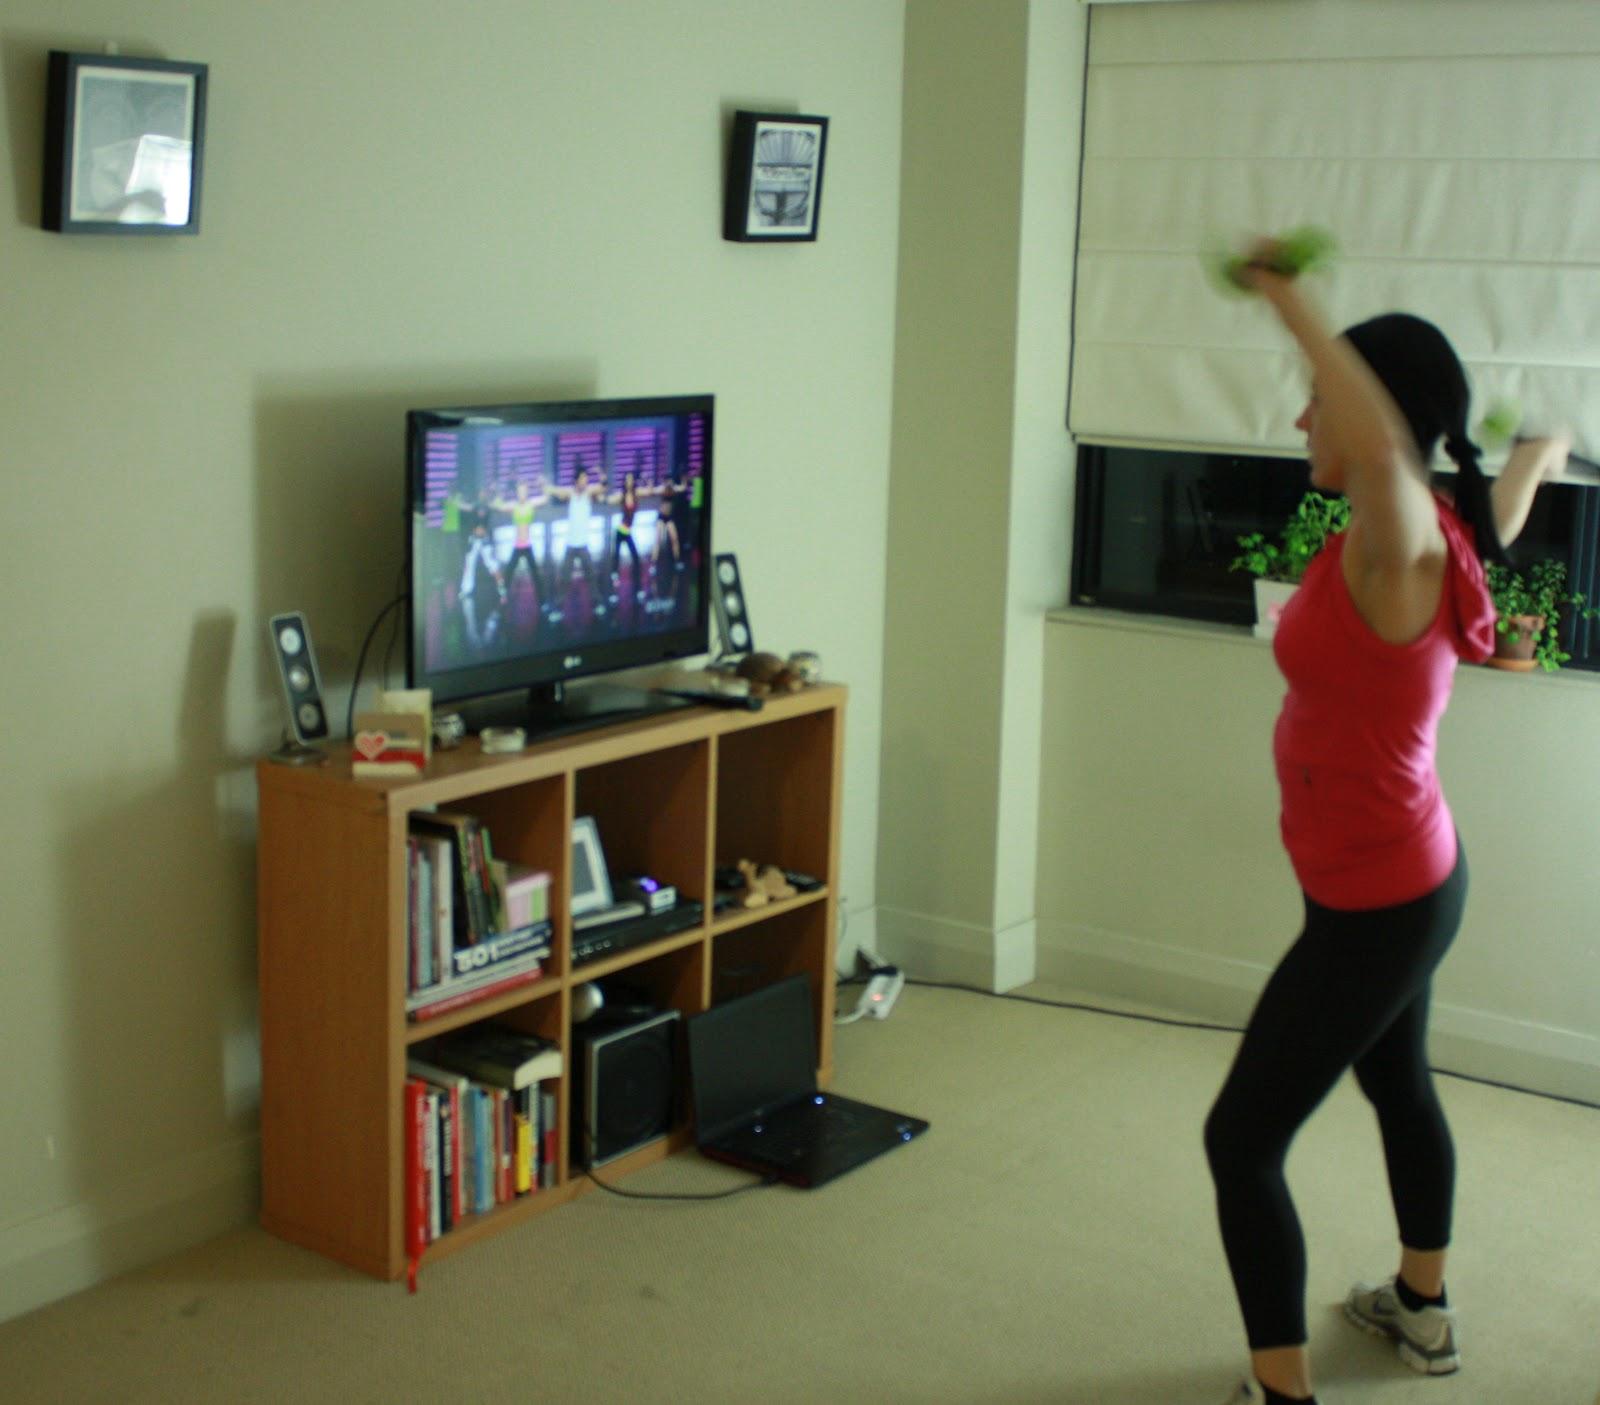 Zumba Fitness Live Dvd: Zumba® Exhilarate DVD Review: Zumba Fitness At Home